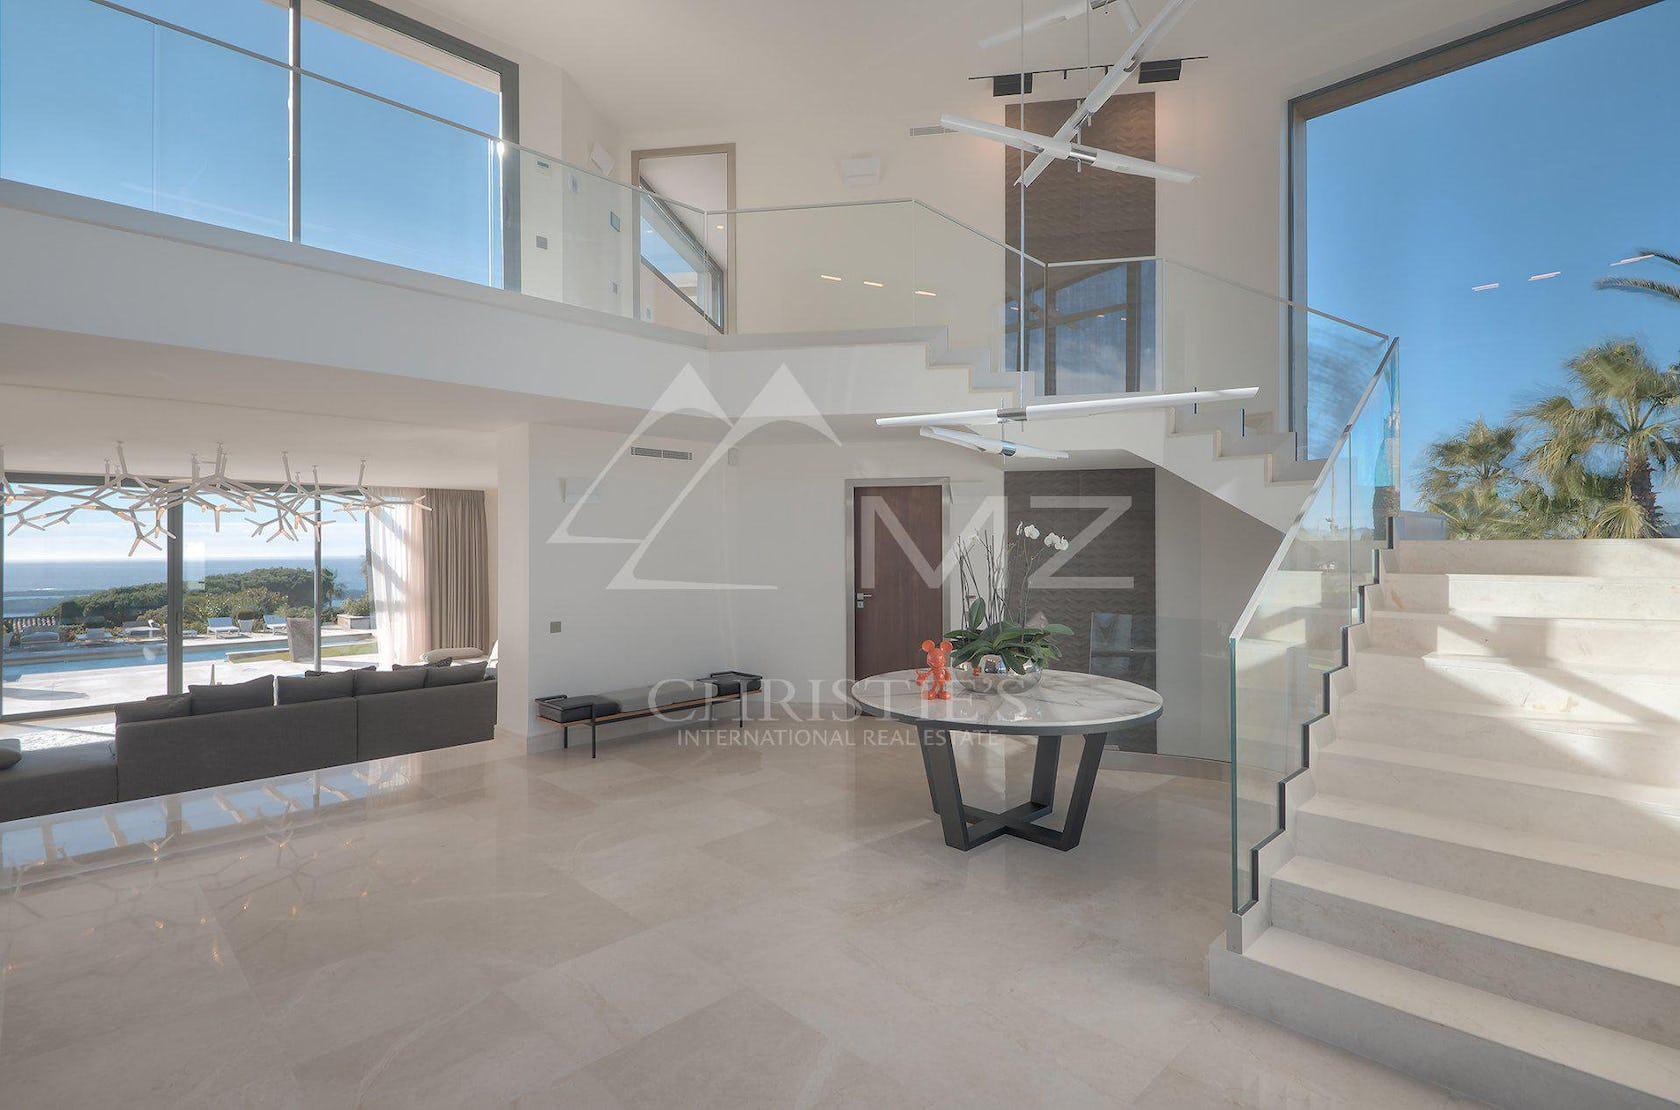 flooring floor housing building interior design indoors handrail banister